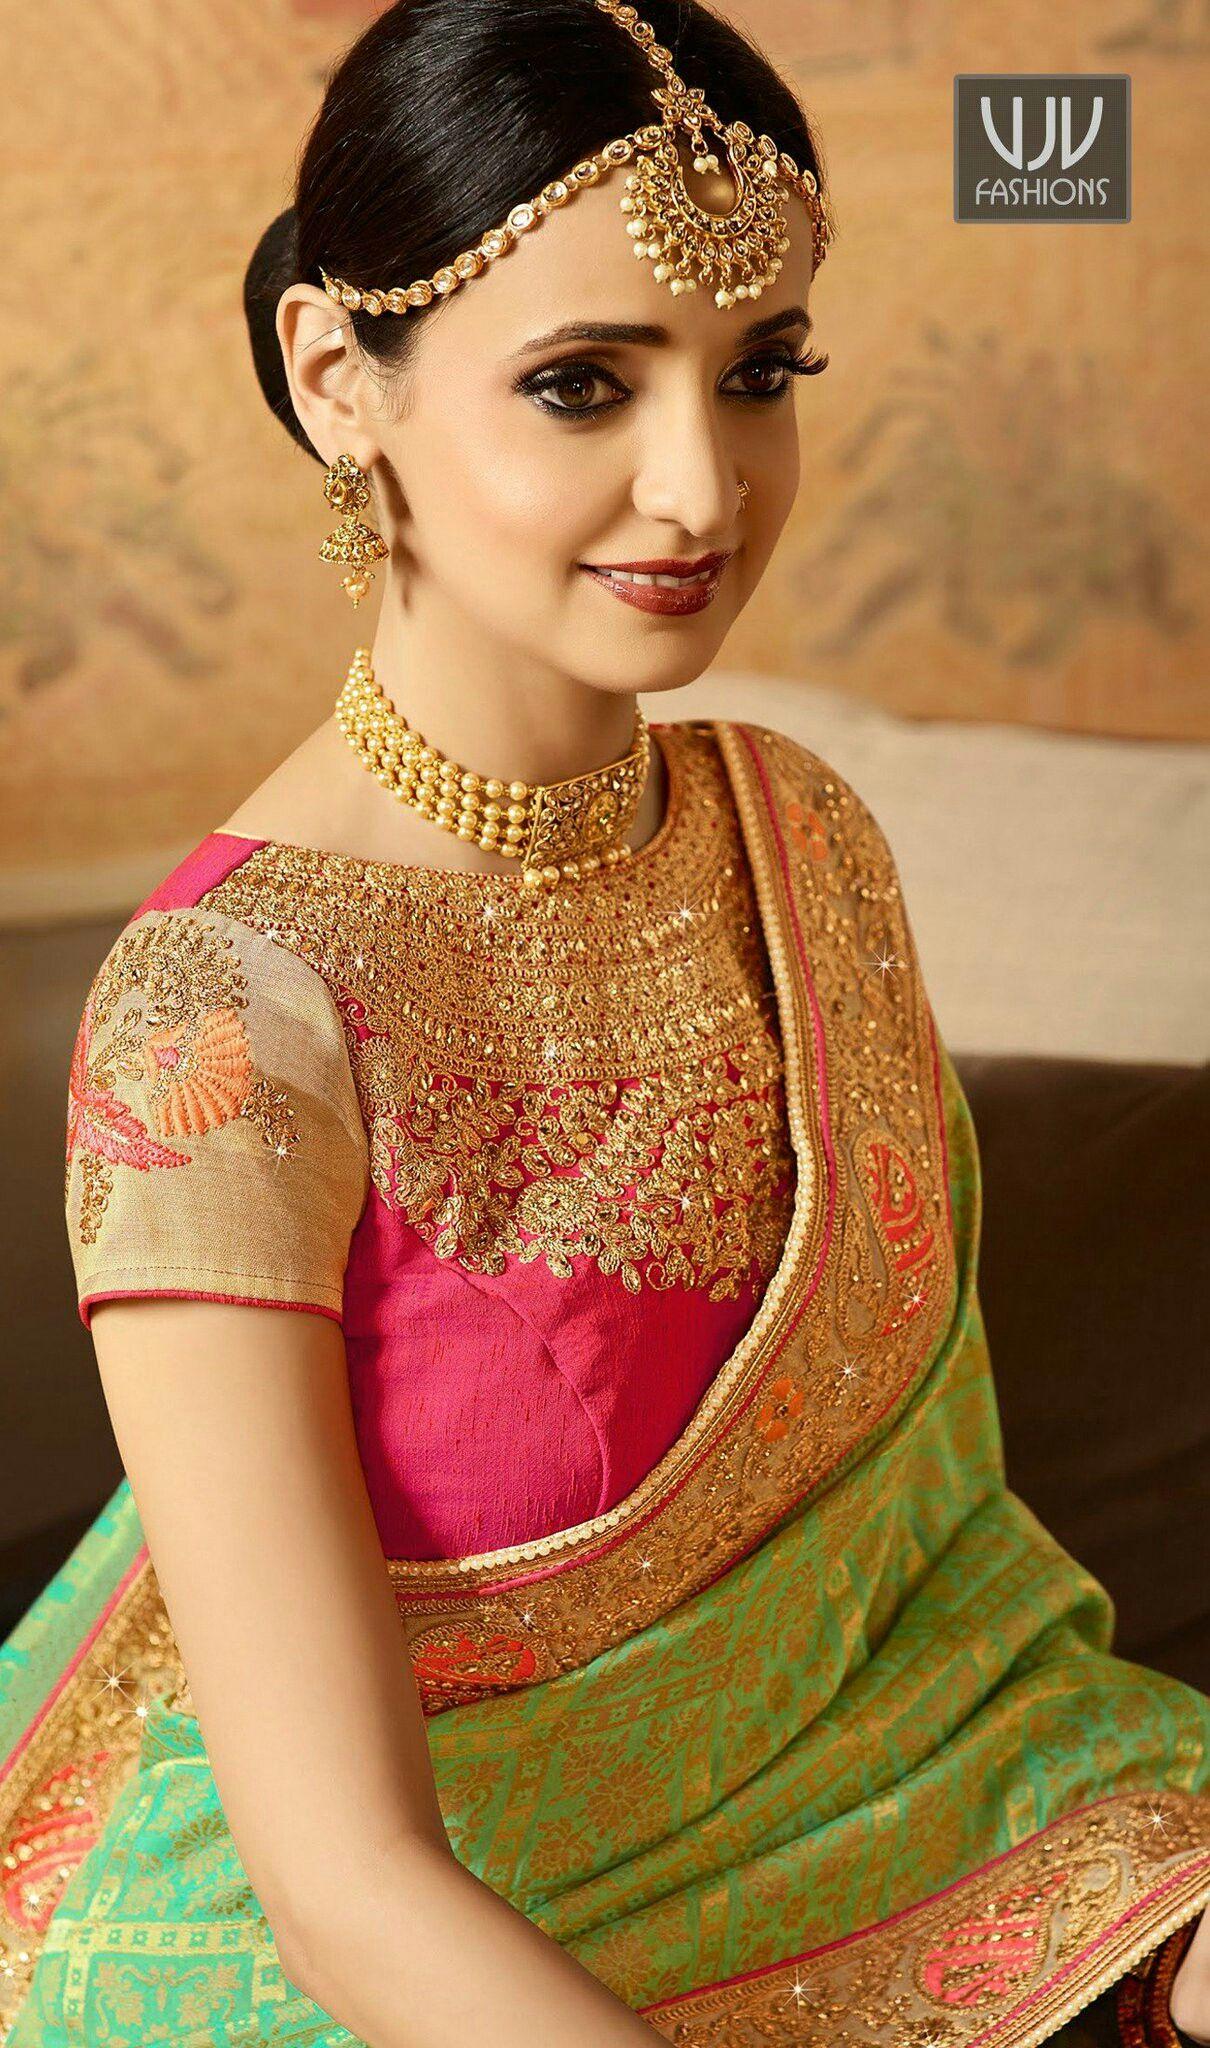 3a29b3ed49 Very pretty | Sanaya irani in 2019 | Saree, Saree wedding, Blouse ...